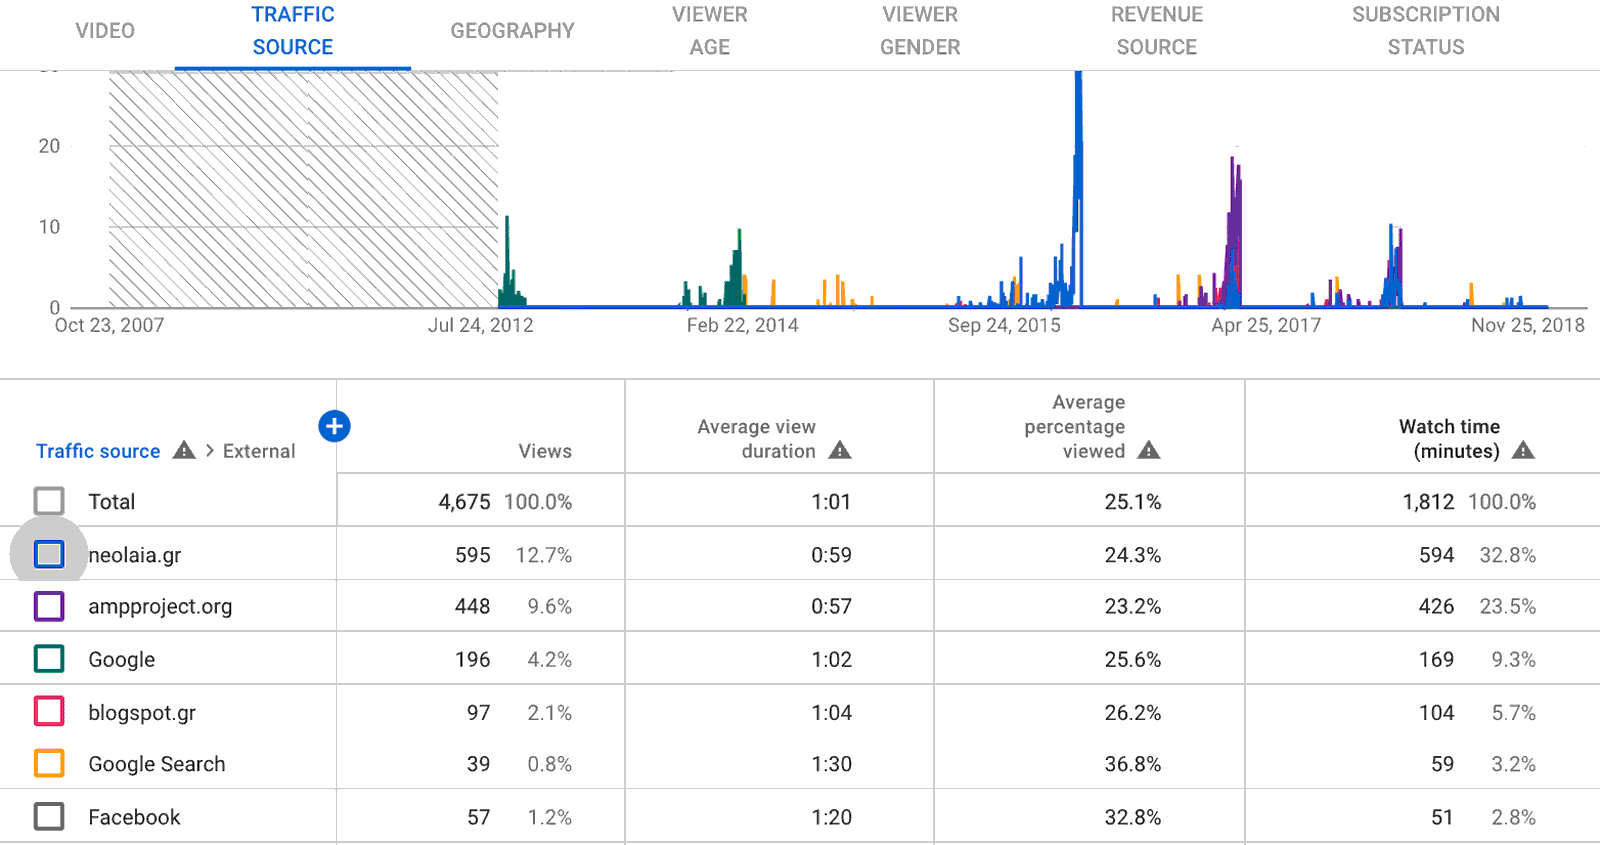 YouTube Analytics: Embedded Traffic Details